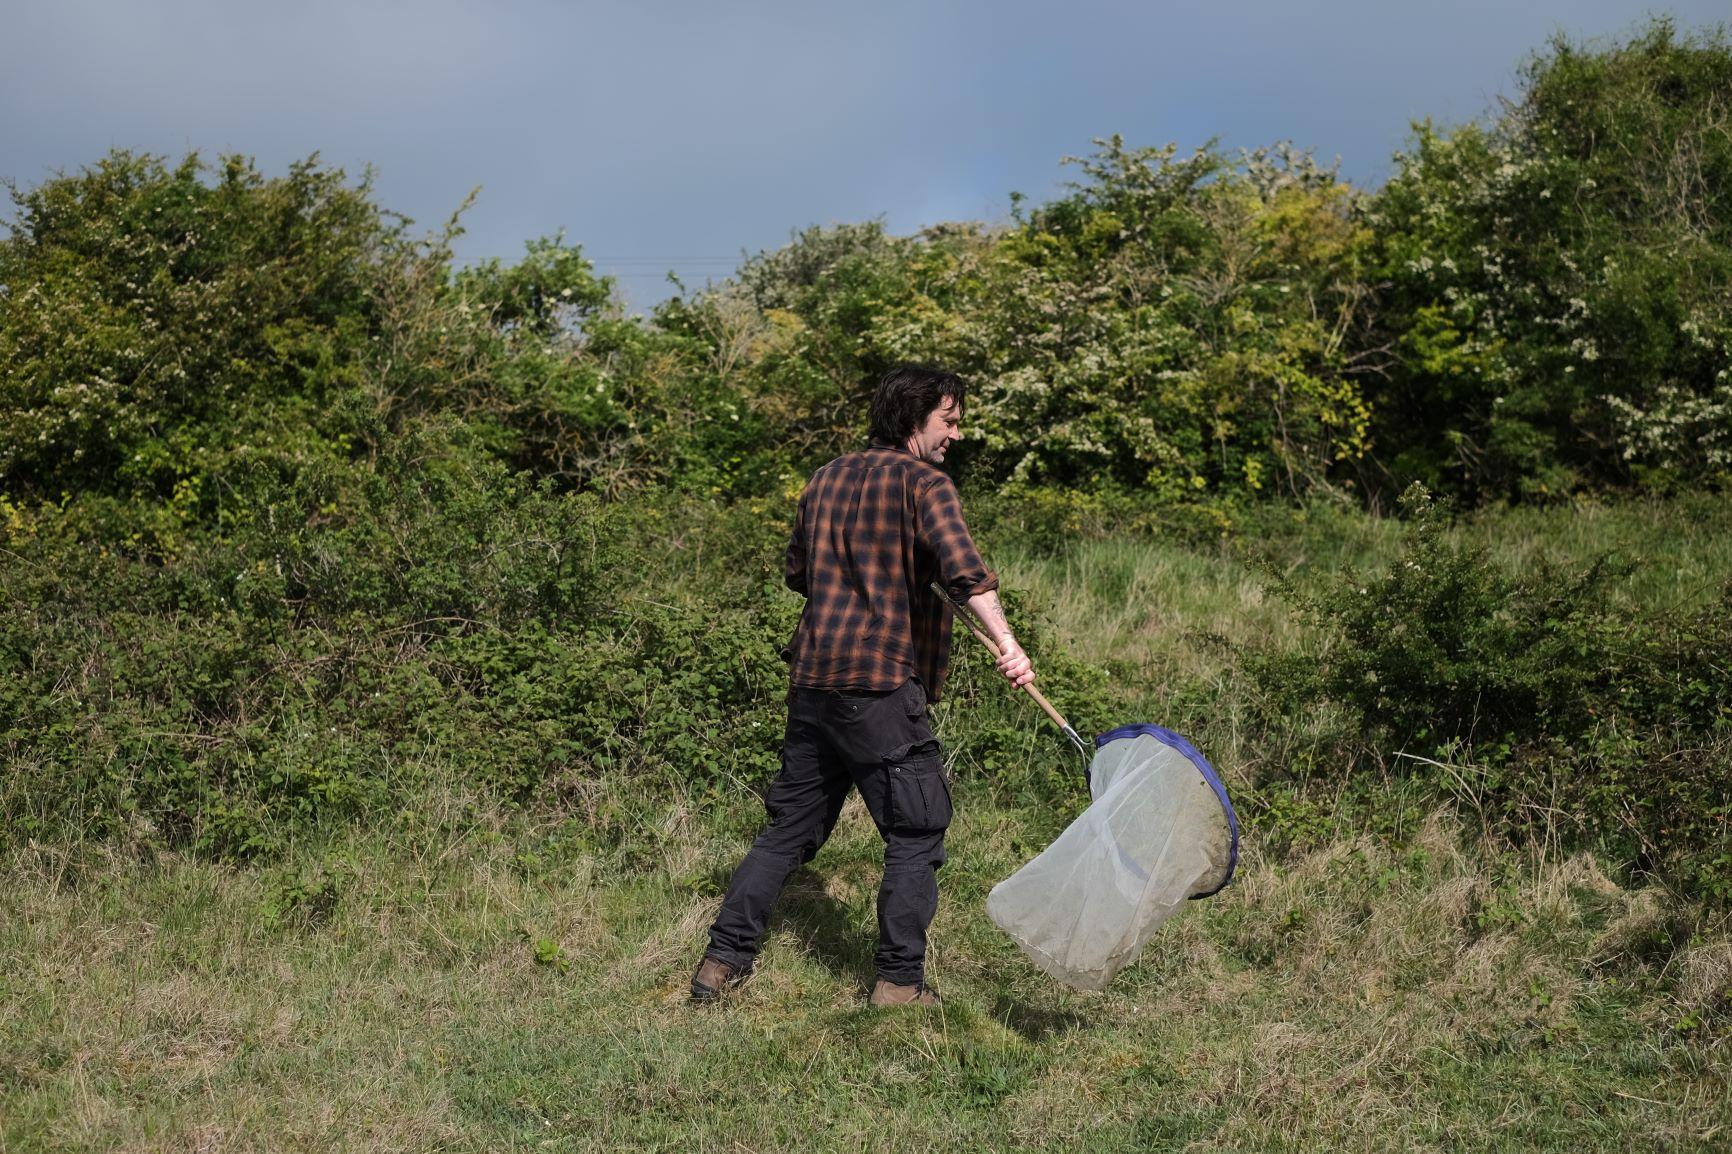 A surveyor sweep netting around grass and scrub during during biodiversity monitoring work